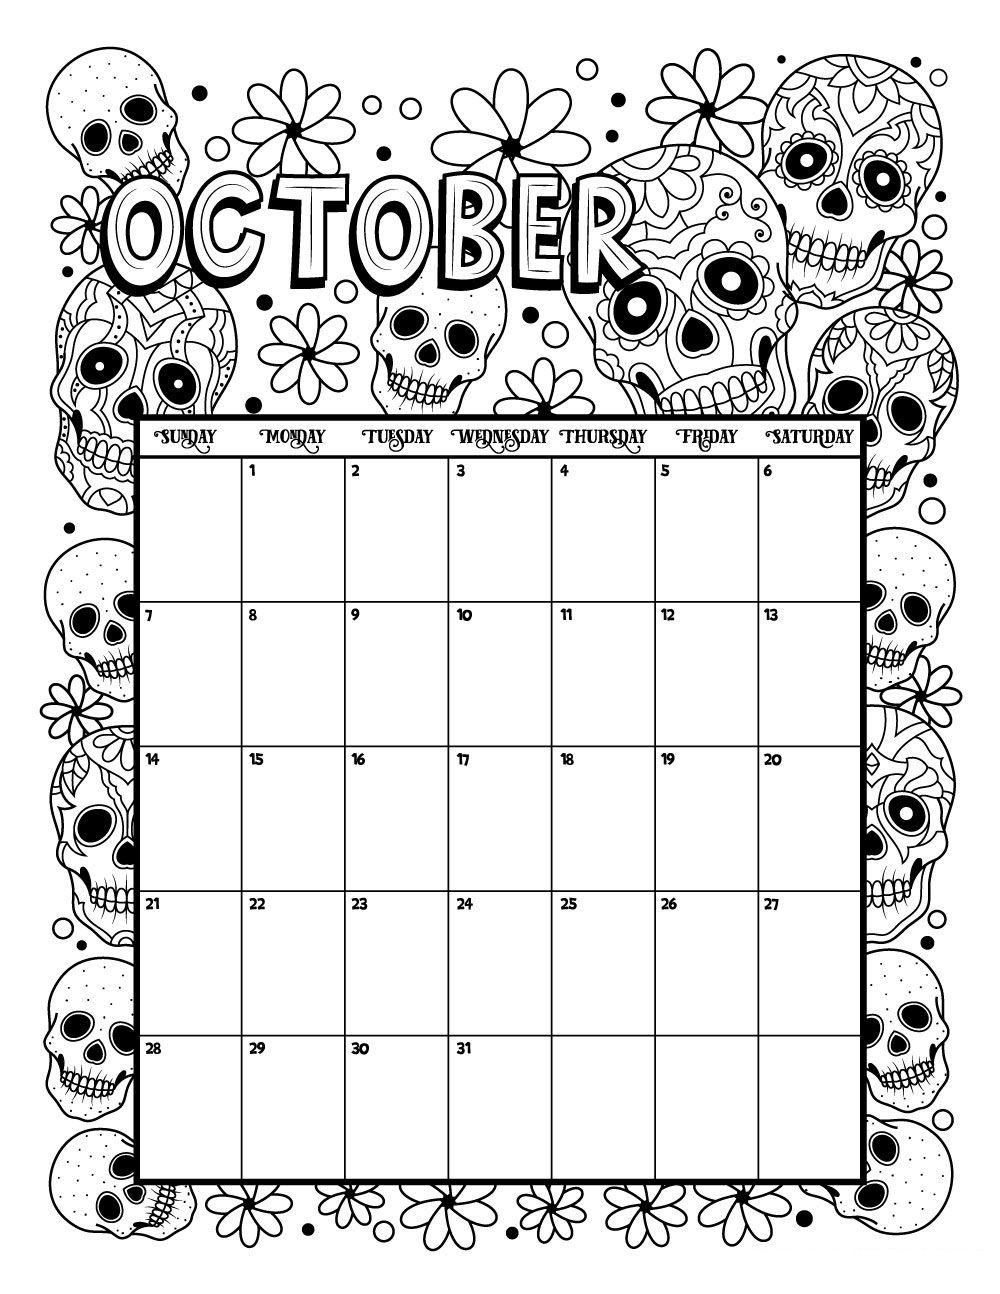 October 2018 Calendar Template With Holidays- For USA, UK